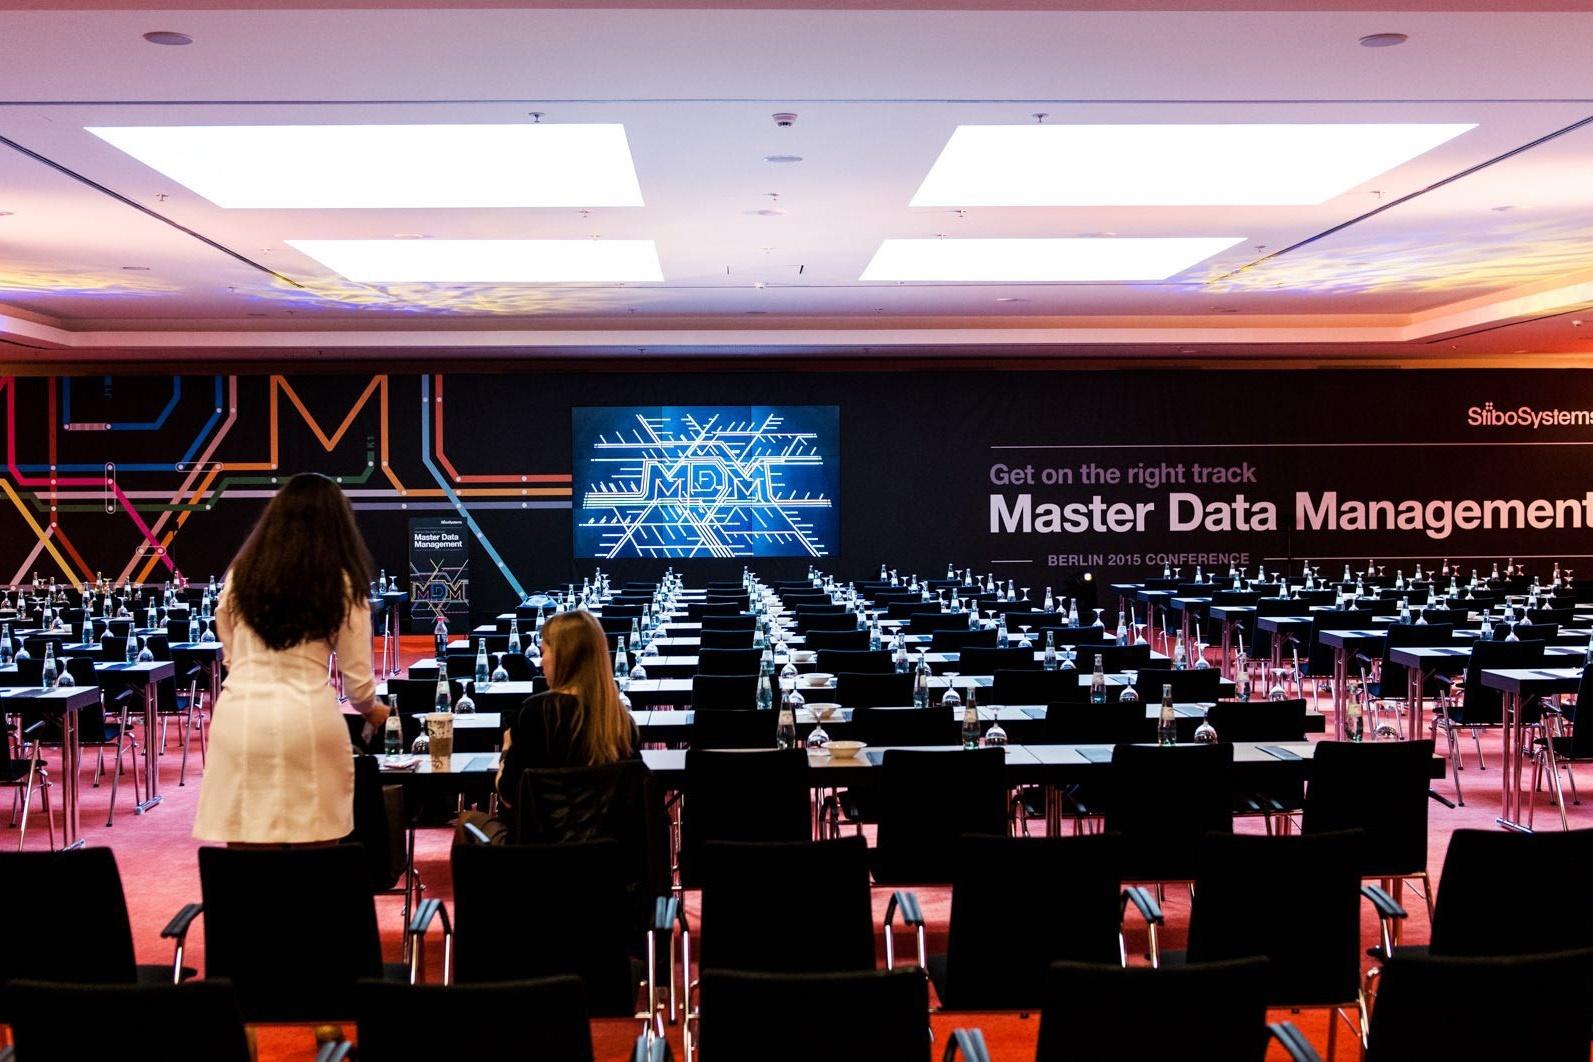 MDM-Event-2.jpg